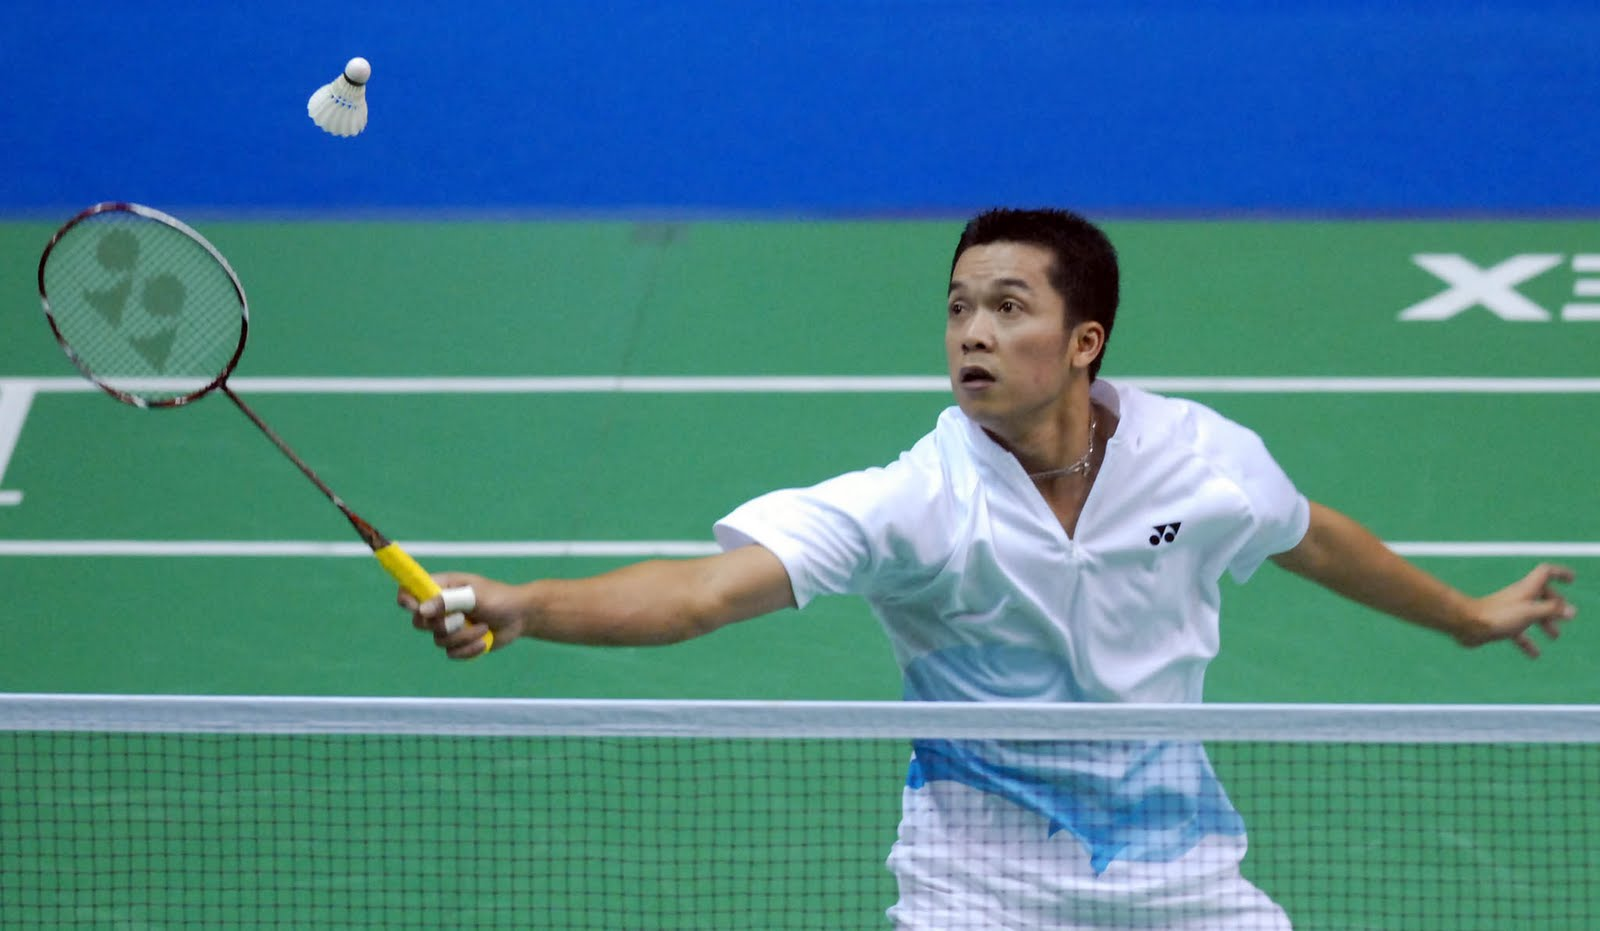 STPB Badminton Club ENHAII: Thomas and Uber Cup 2012 Wuhan ... Badminton